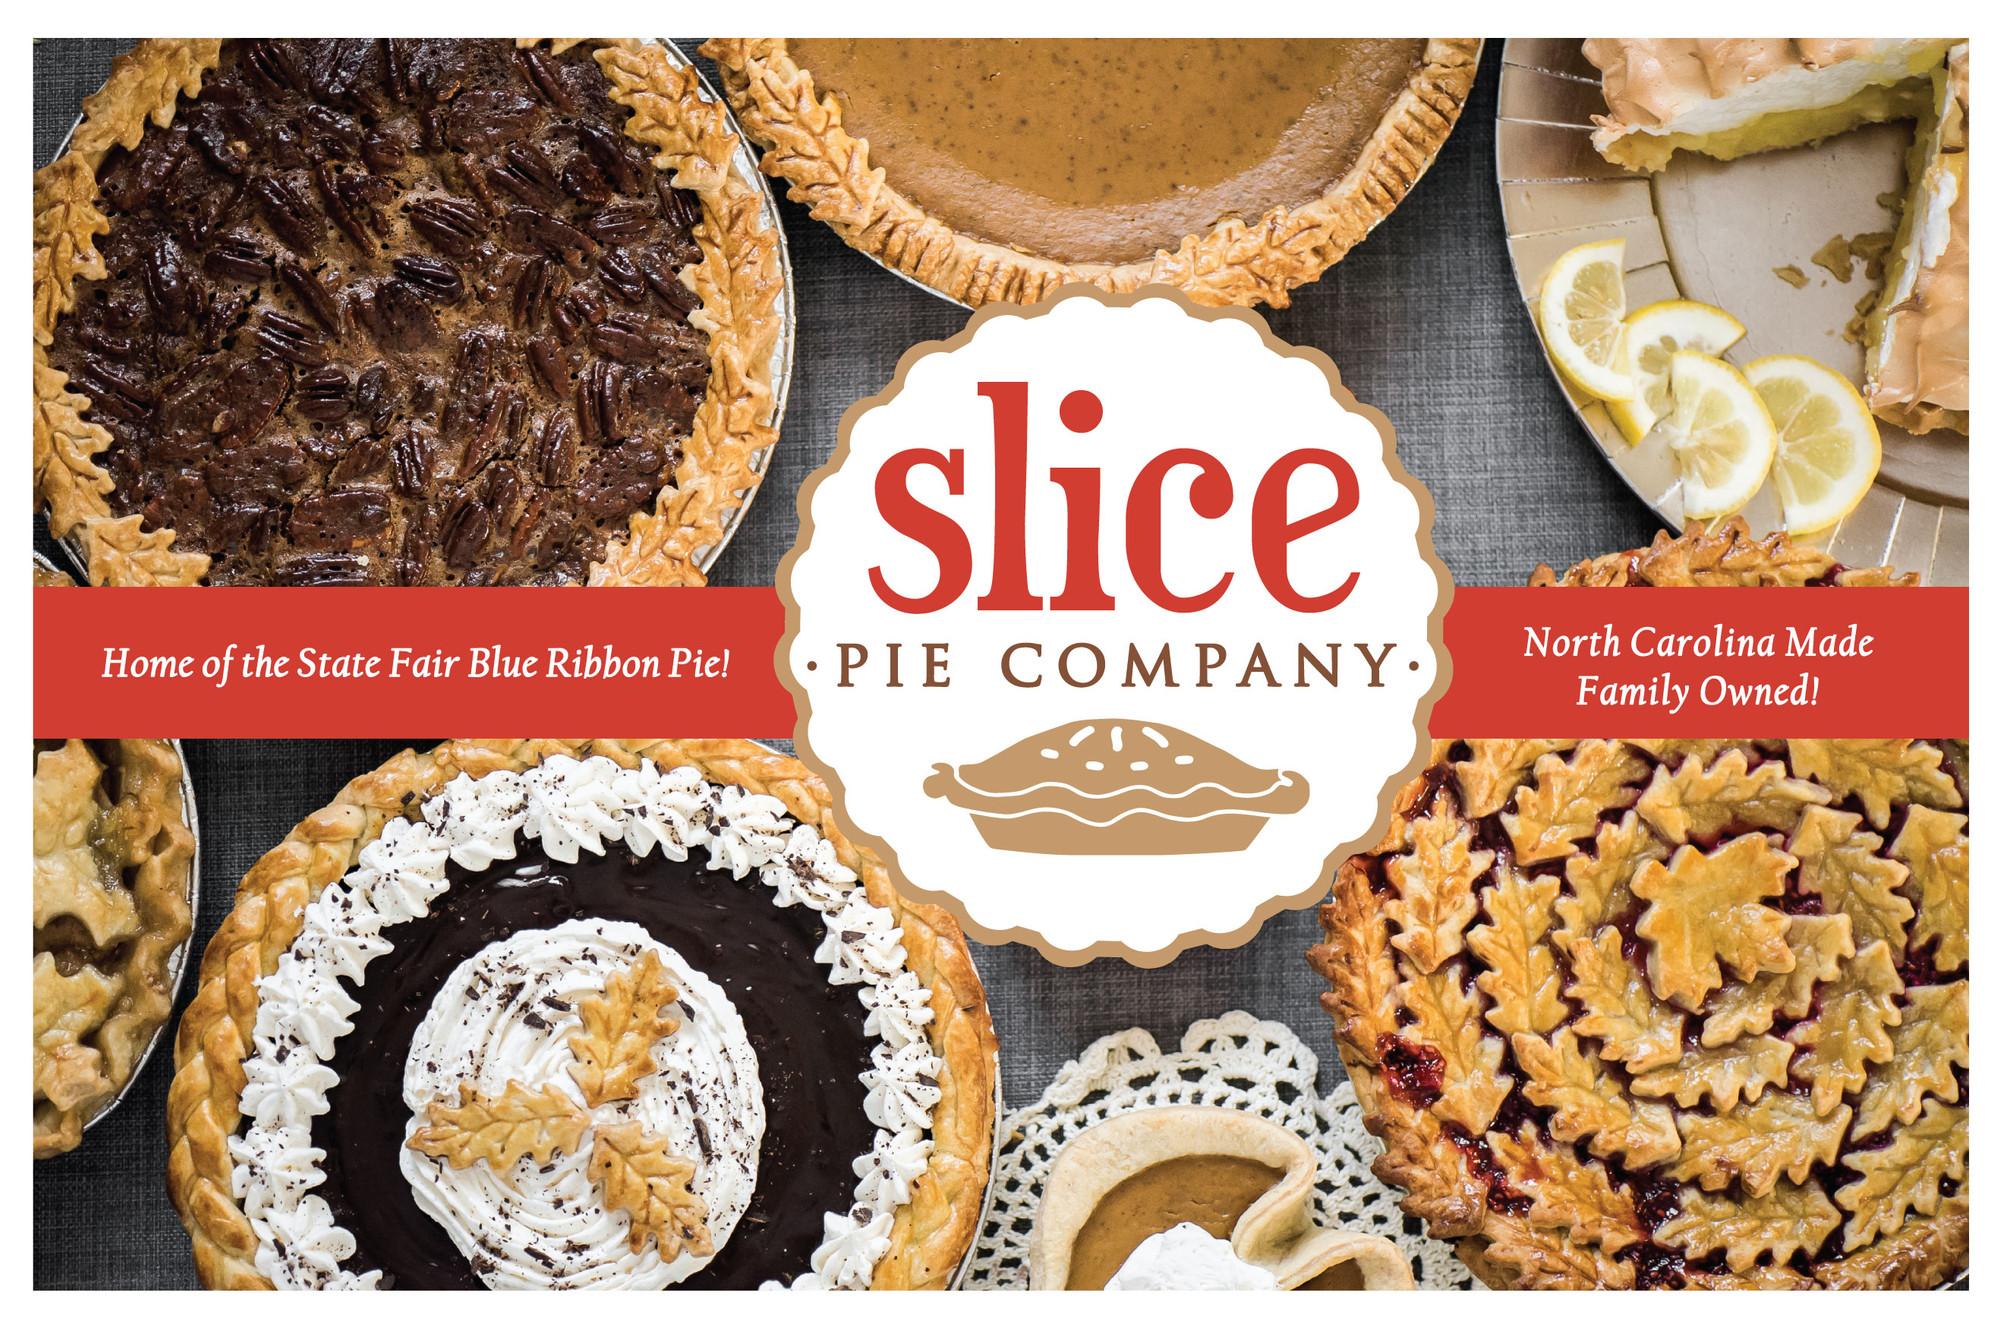 Classic Pies Slice